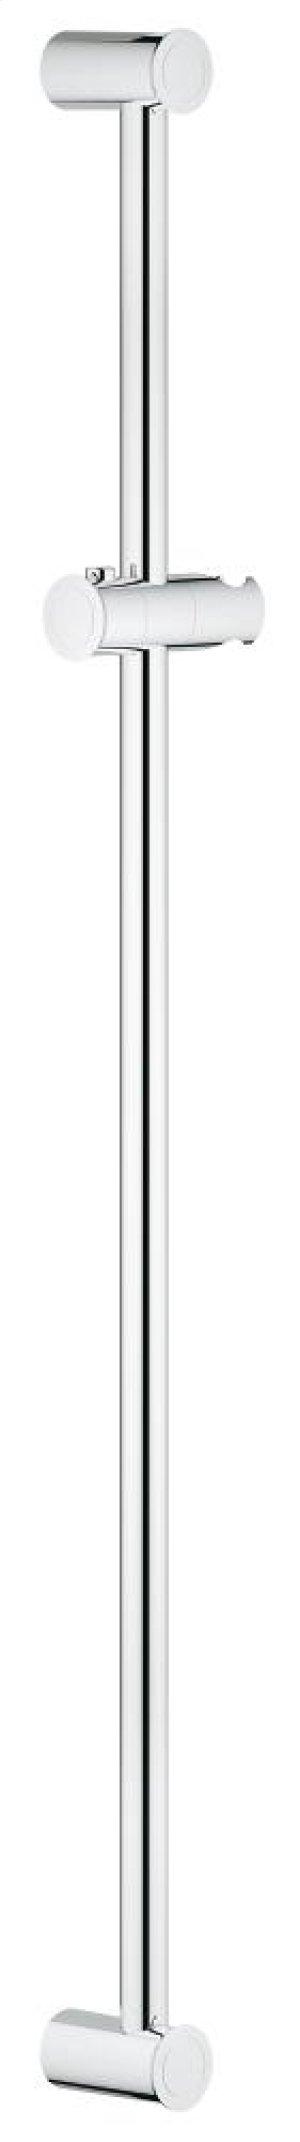 36 Shower Bar Product Image